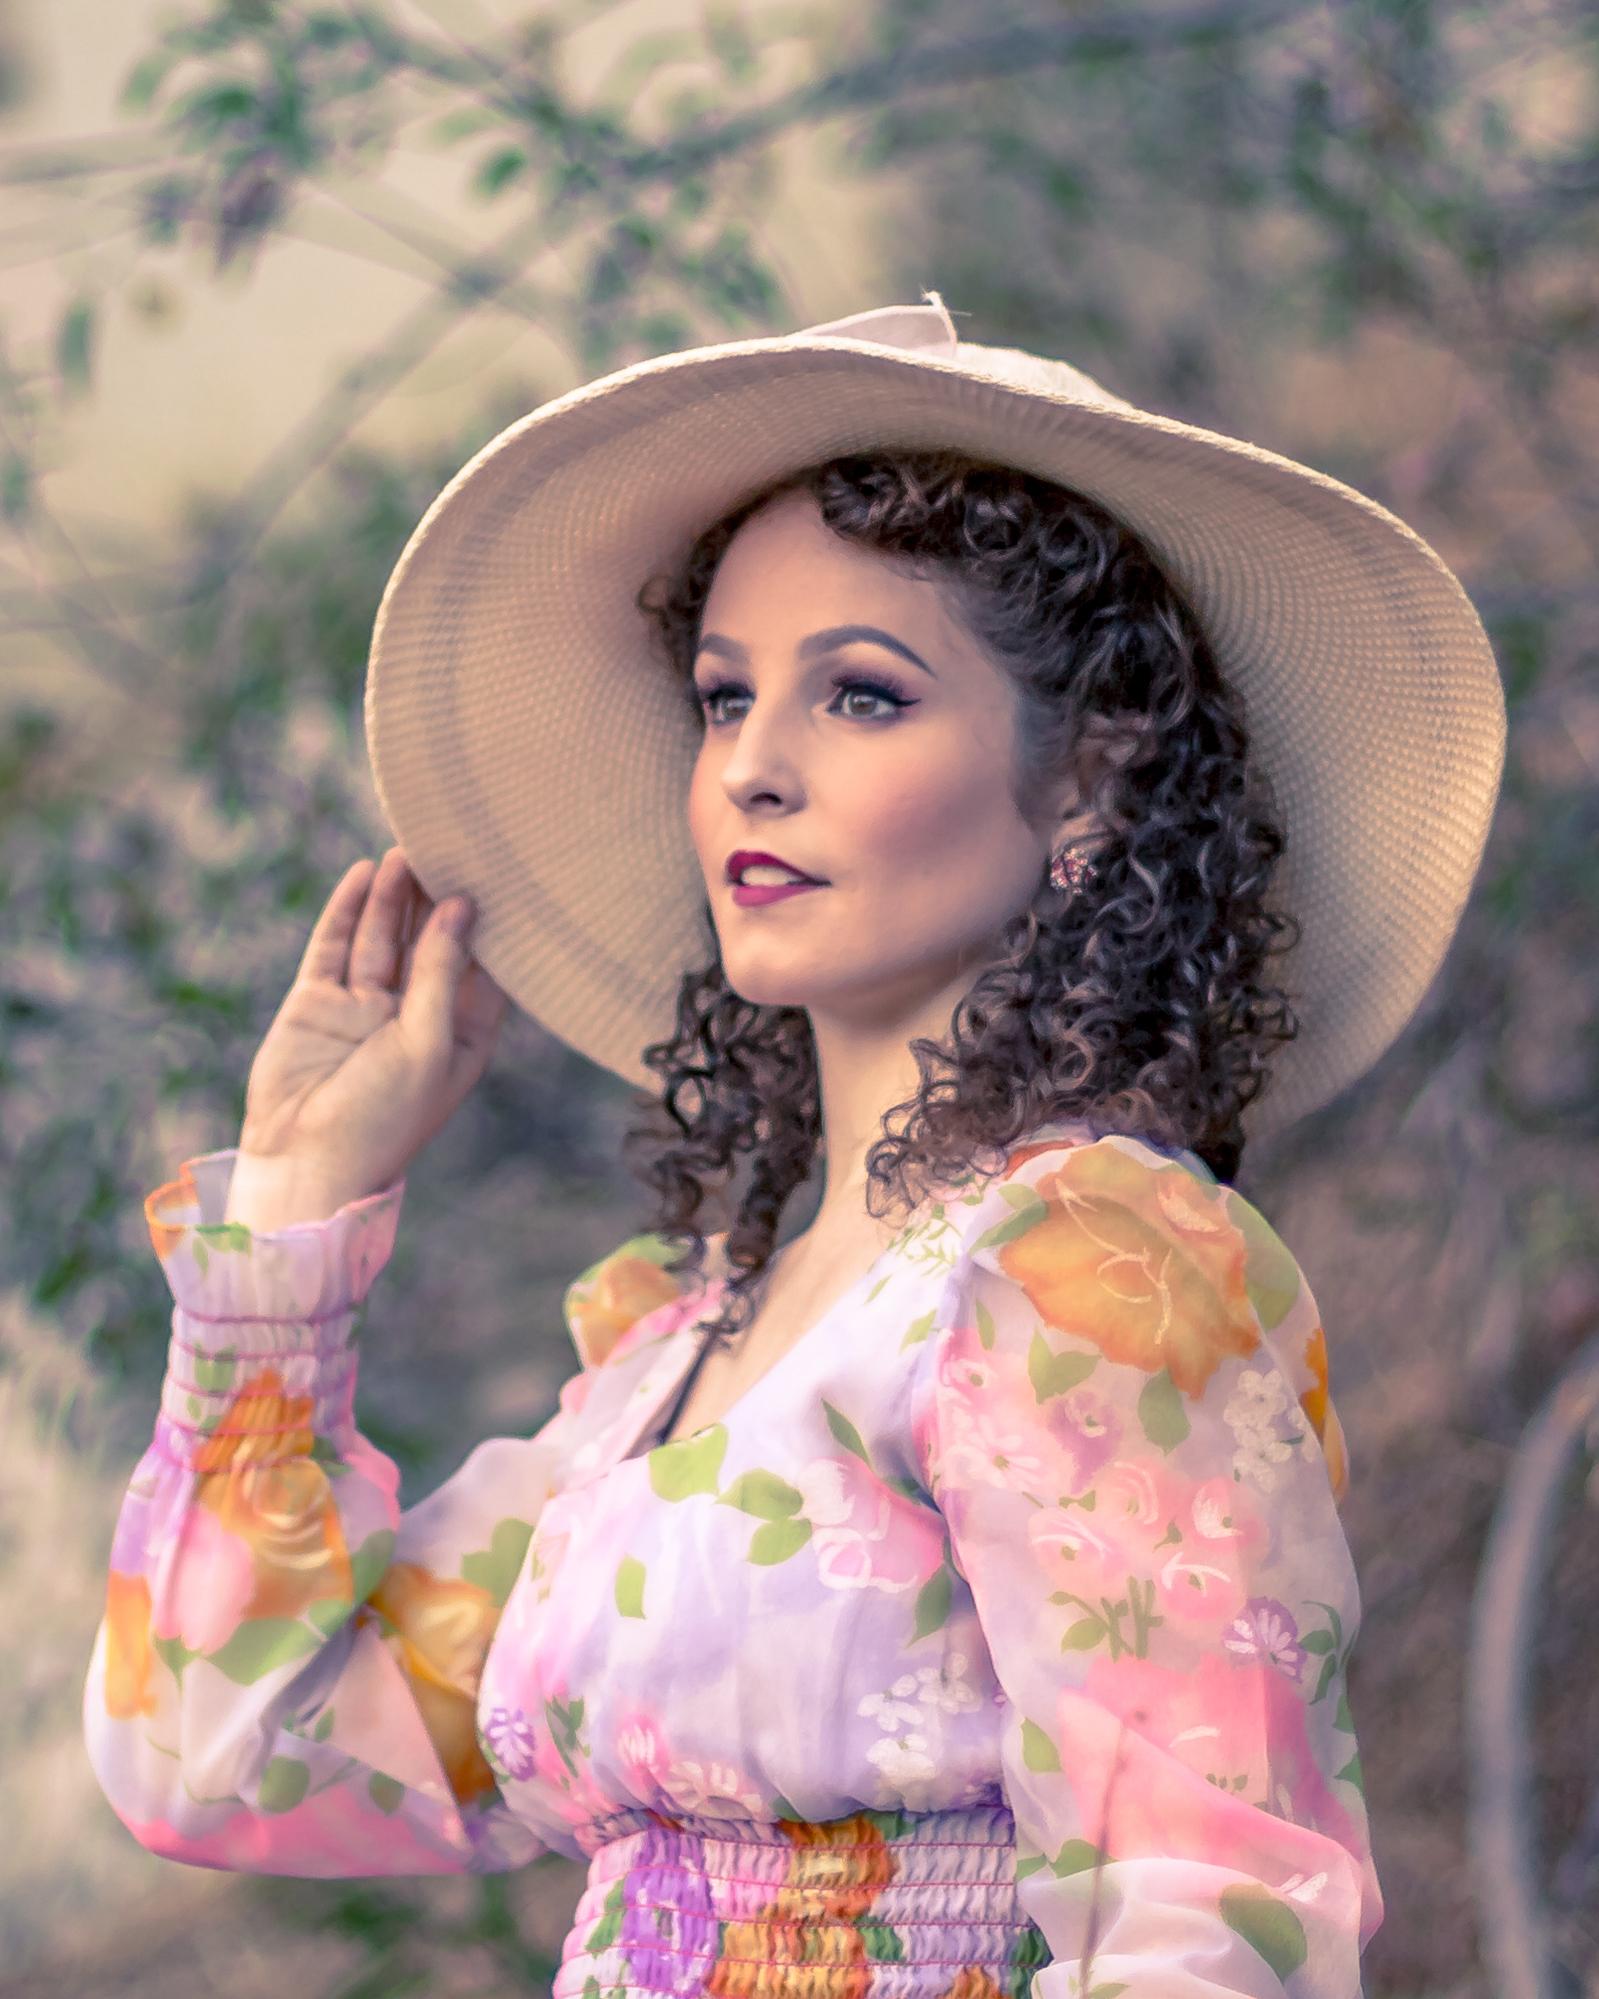 Portrait of Model Katie Hume (@KatHelHum) - © Jake Ross - 7/22/2018